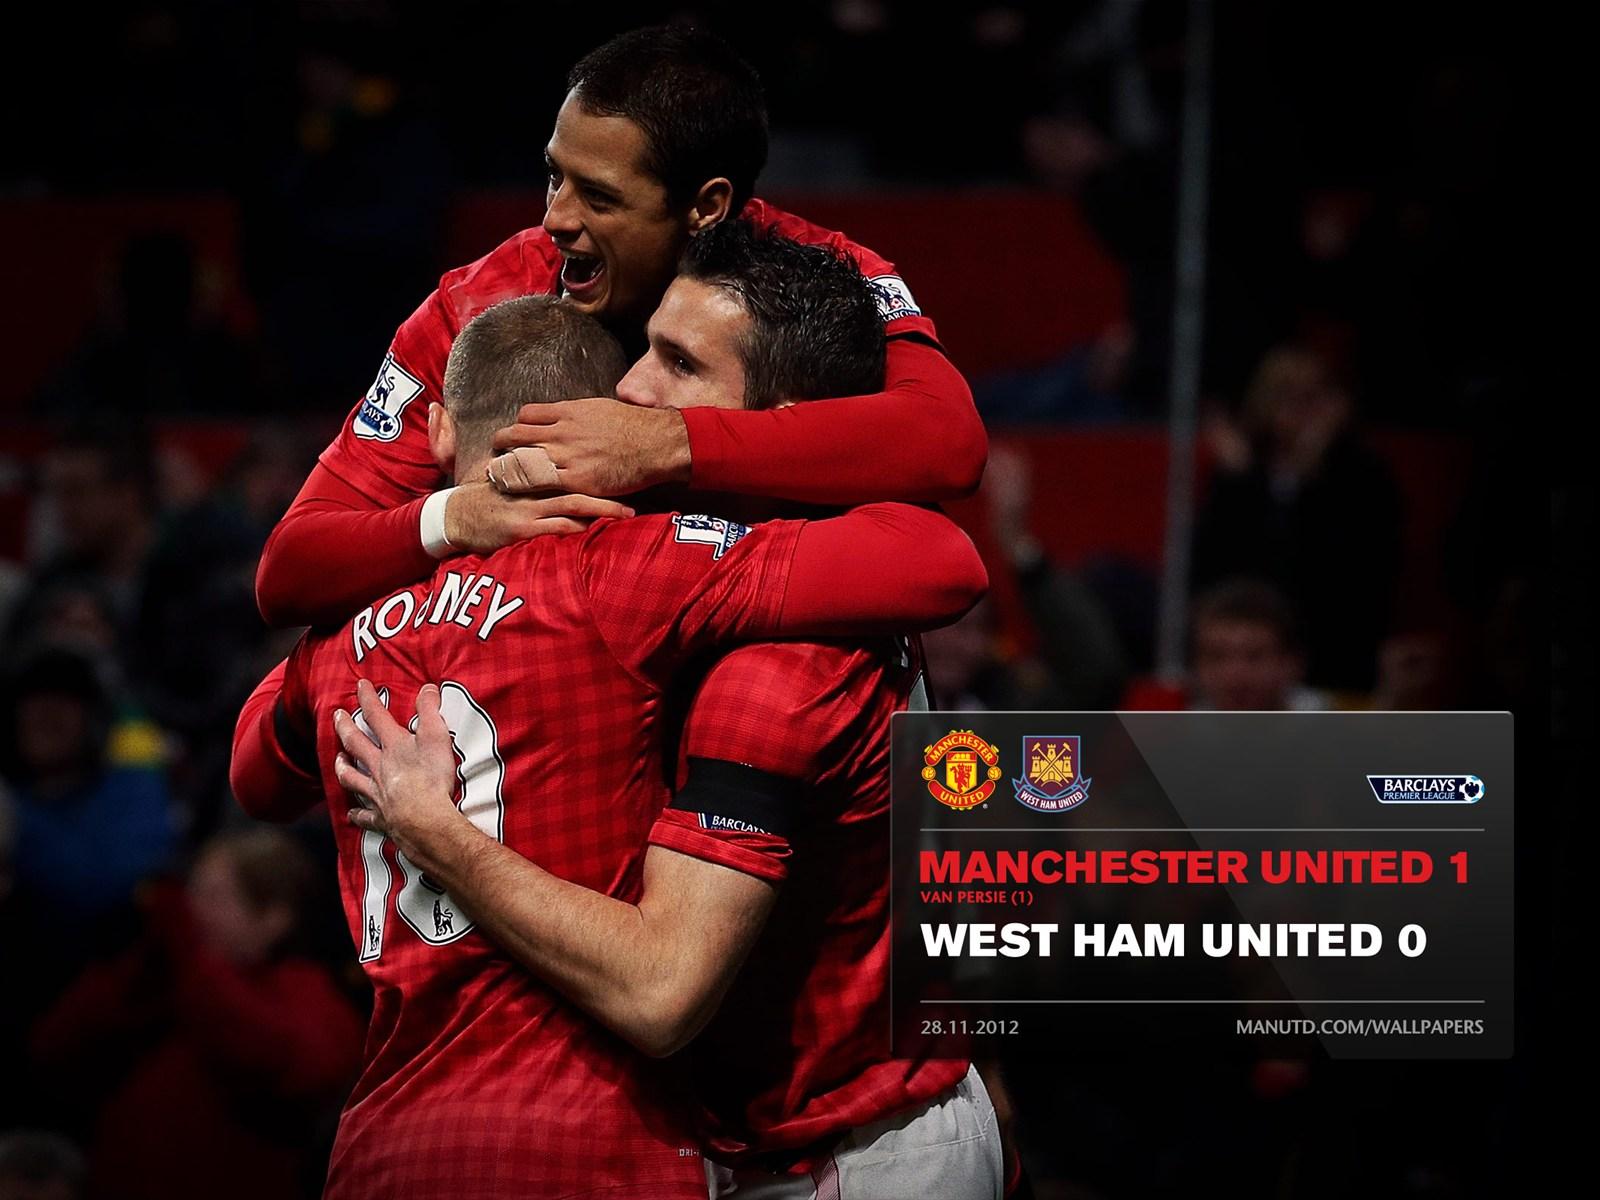 http://4.bp.blogspot.com/-mxHKAYAwWHo/UL2y2V5I8KI/AAAAAAAABYc/QwEabvQ9C-E/s1600/pinal_score_wallpaper_manchester_united_vs_west_ham_united_1-0.jpeg